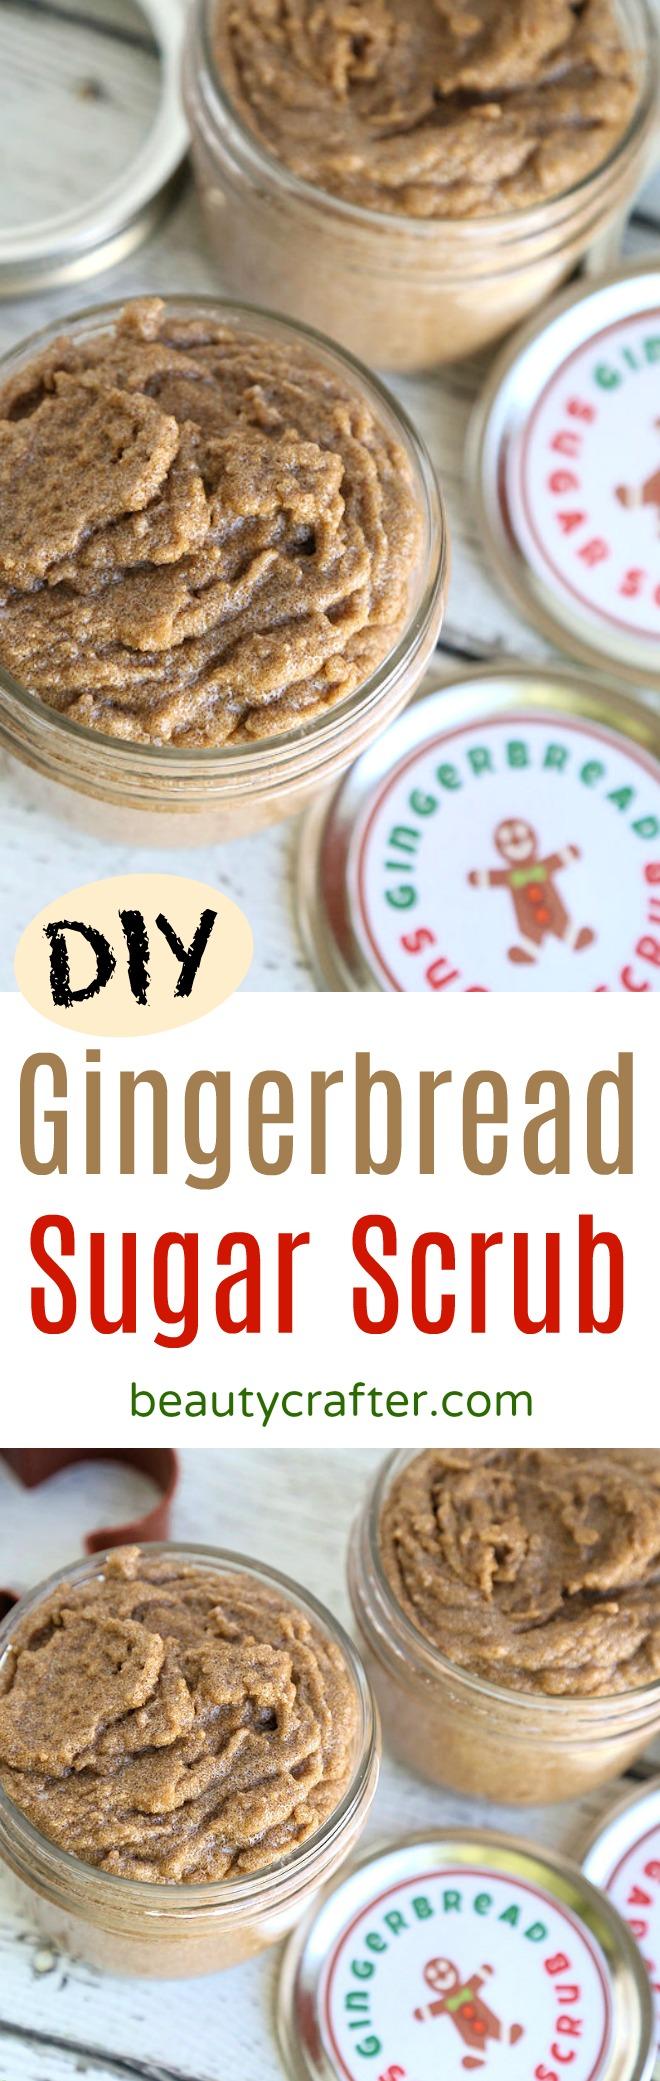 DIY Gingerbread Sugar Scrub recipe - easy homemade Christmas gift! #gingerbread #Christmas #holidays #sugarscrub #diygift